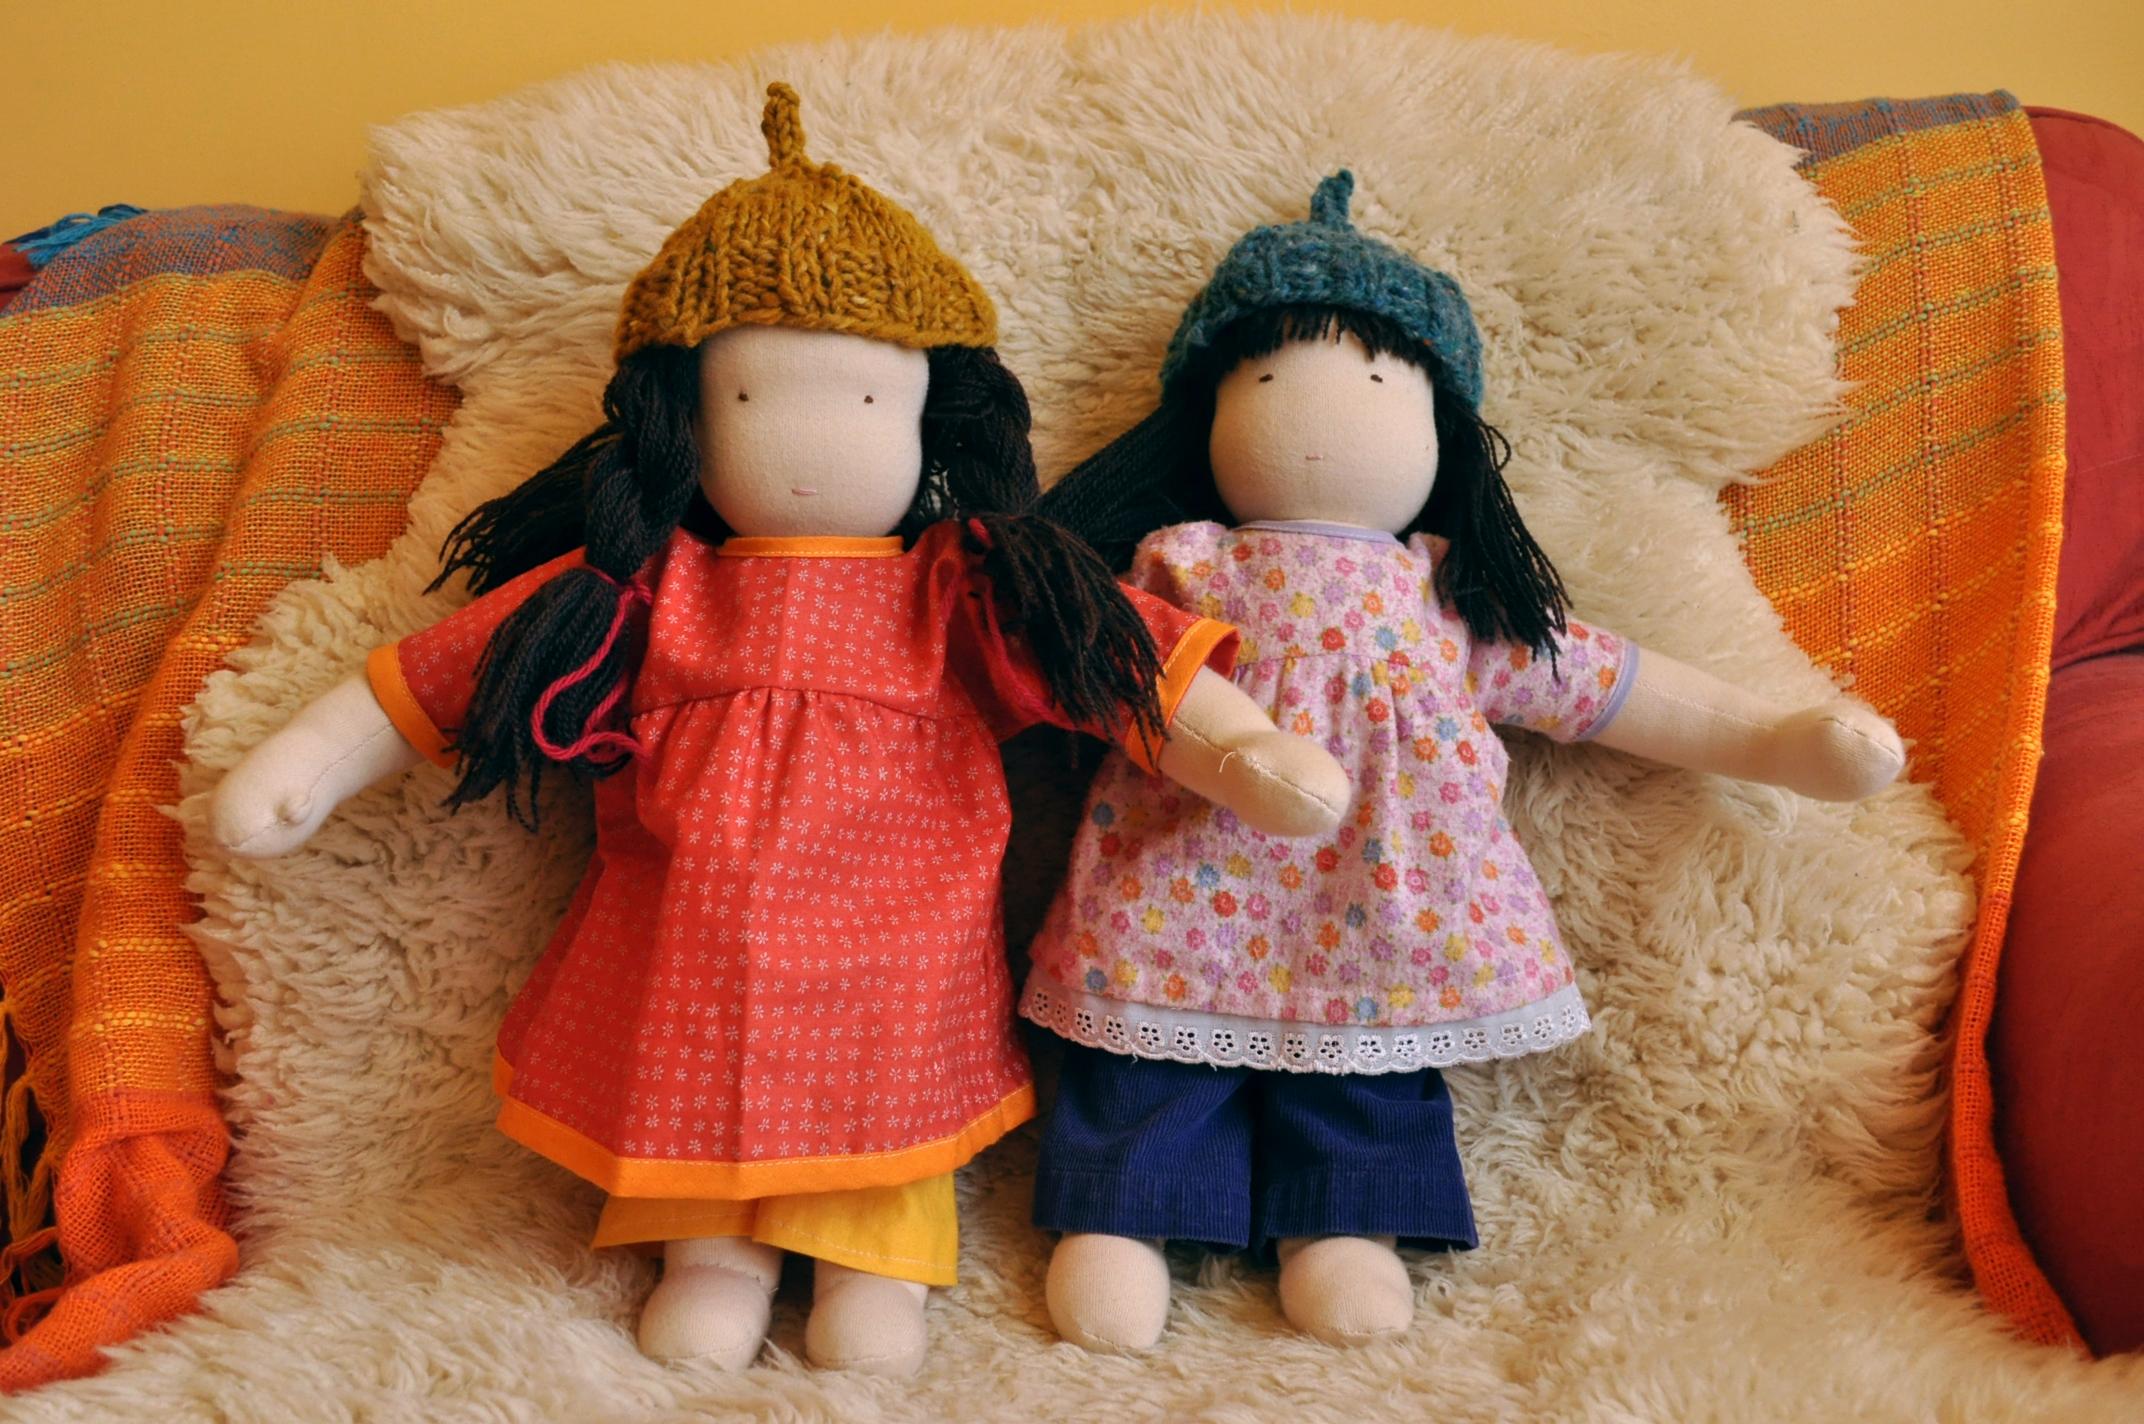 Lily & Mirabella